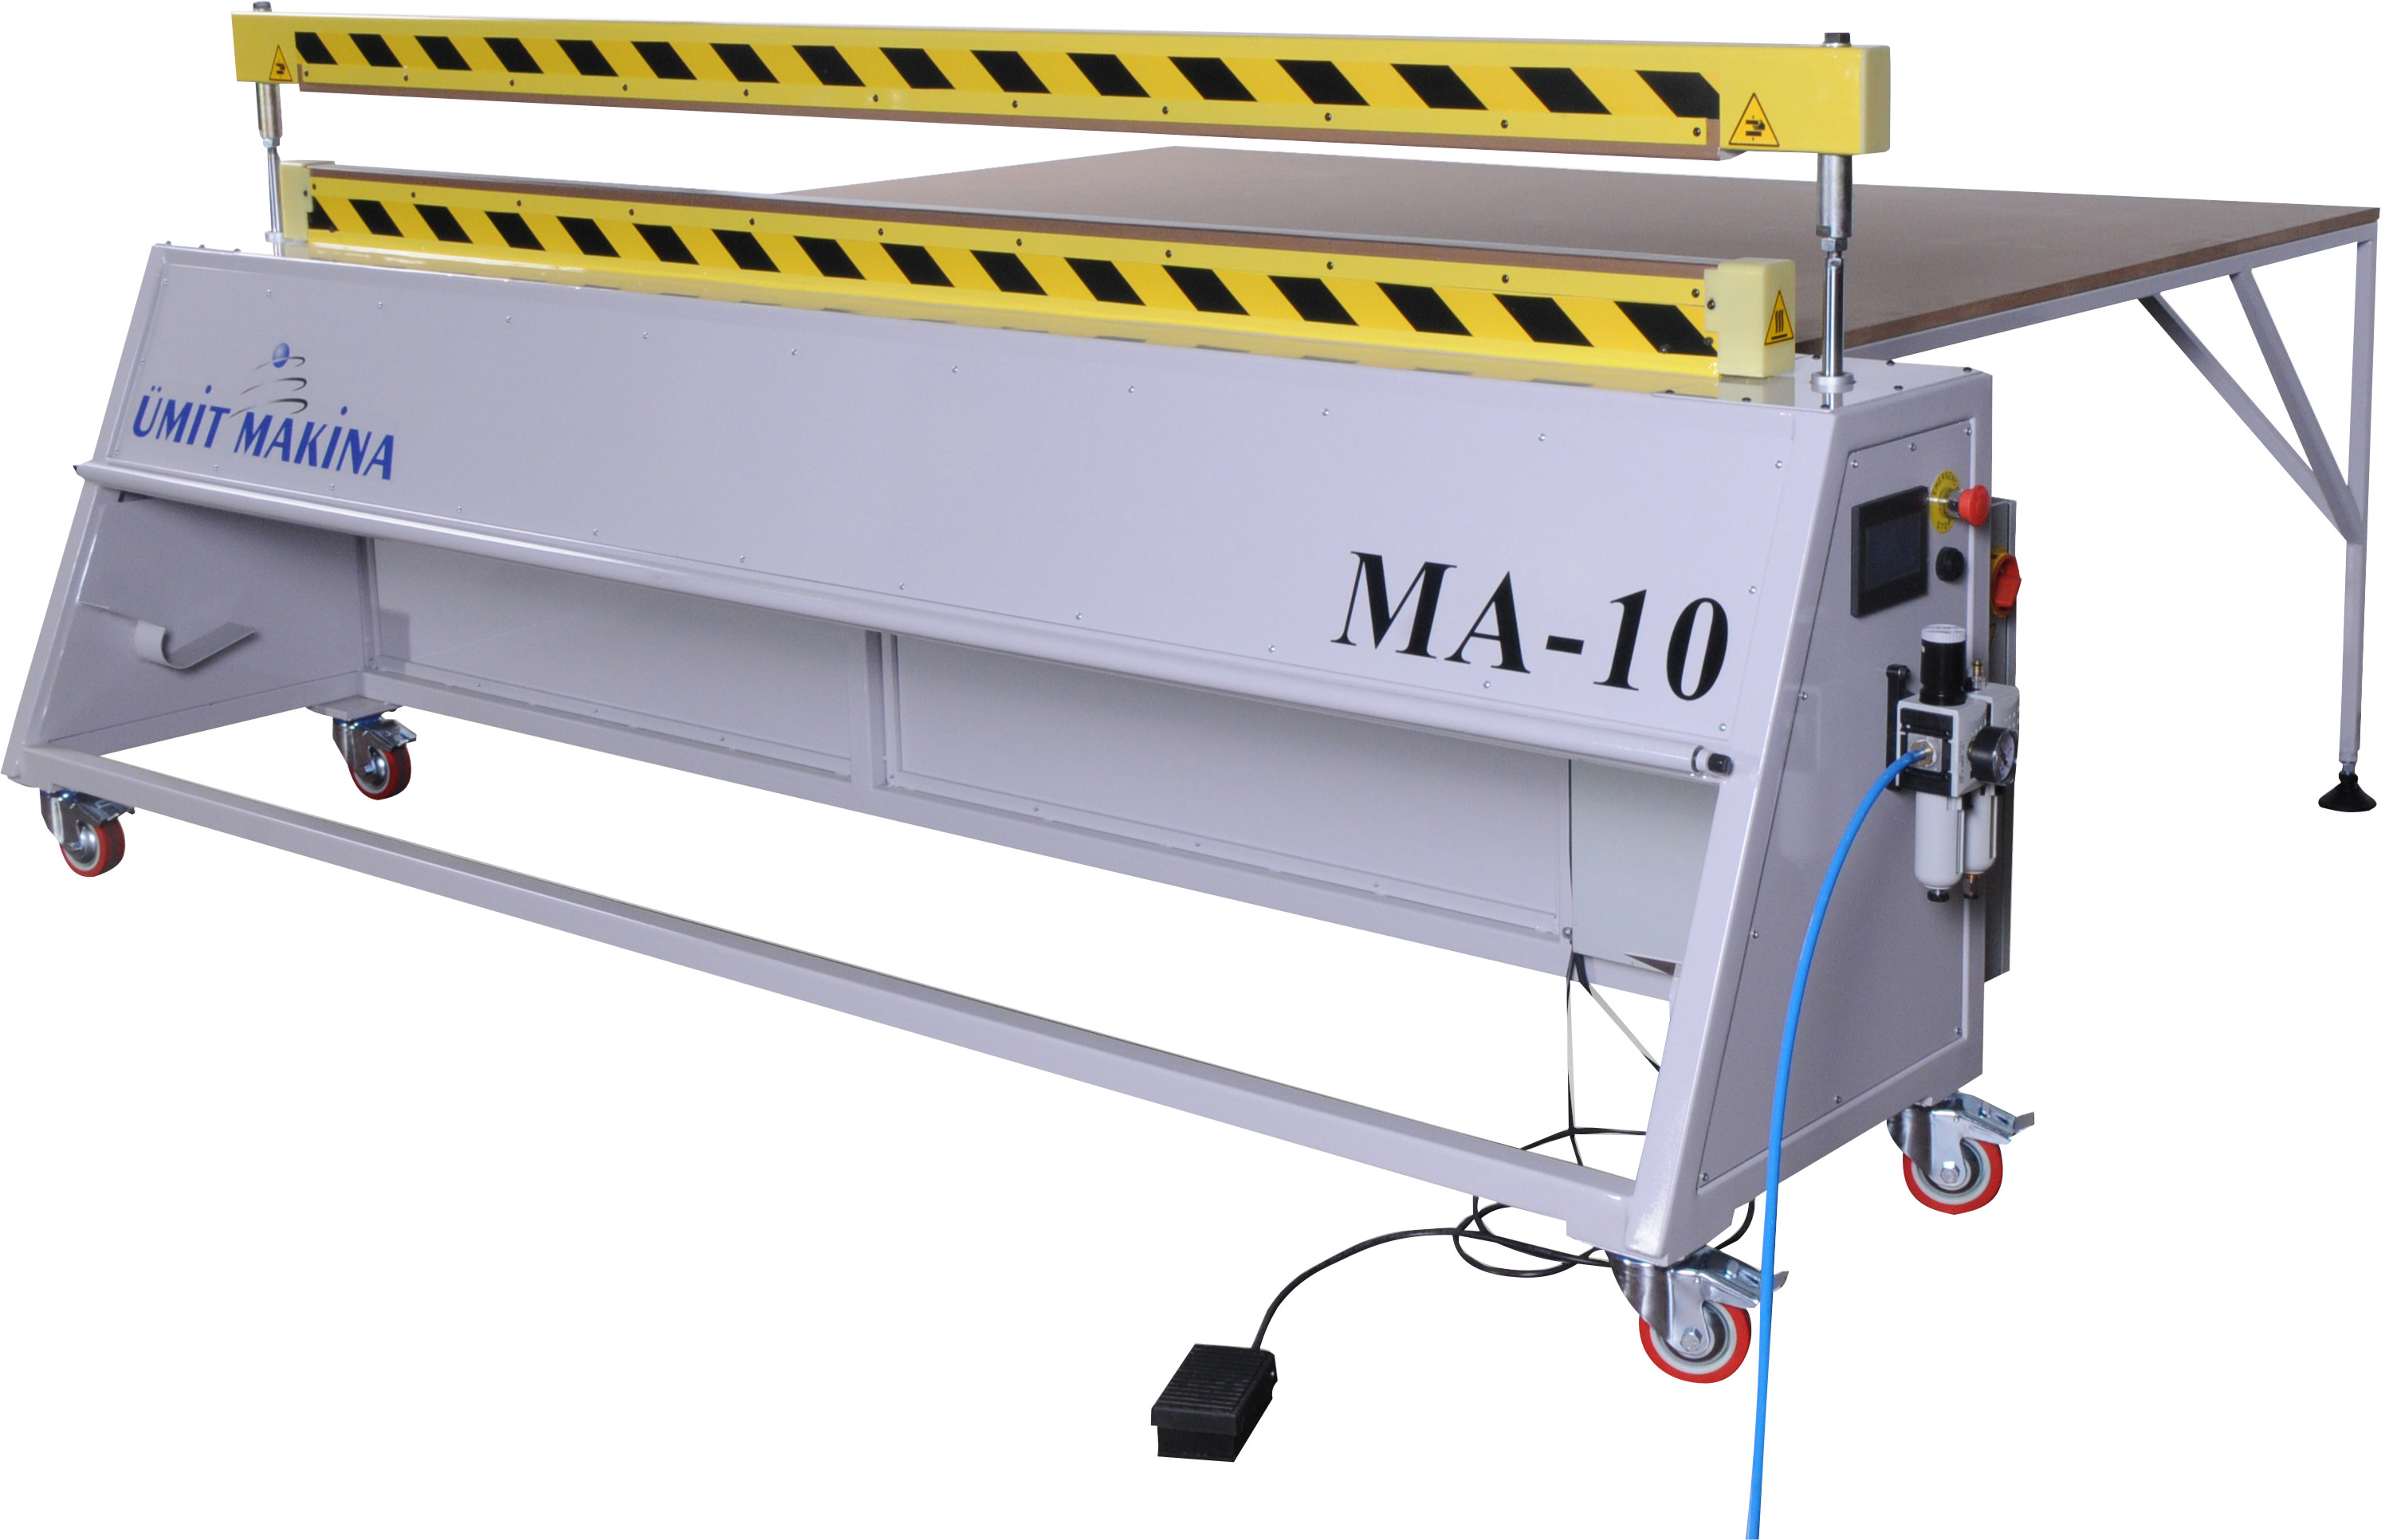 MA-10